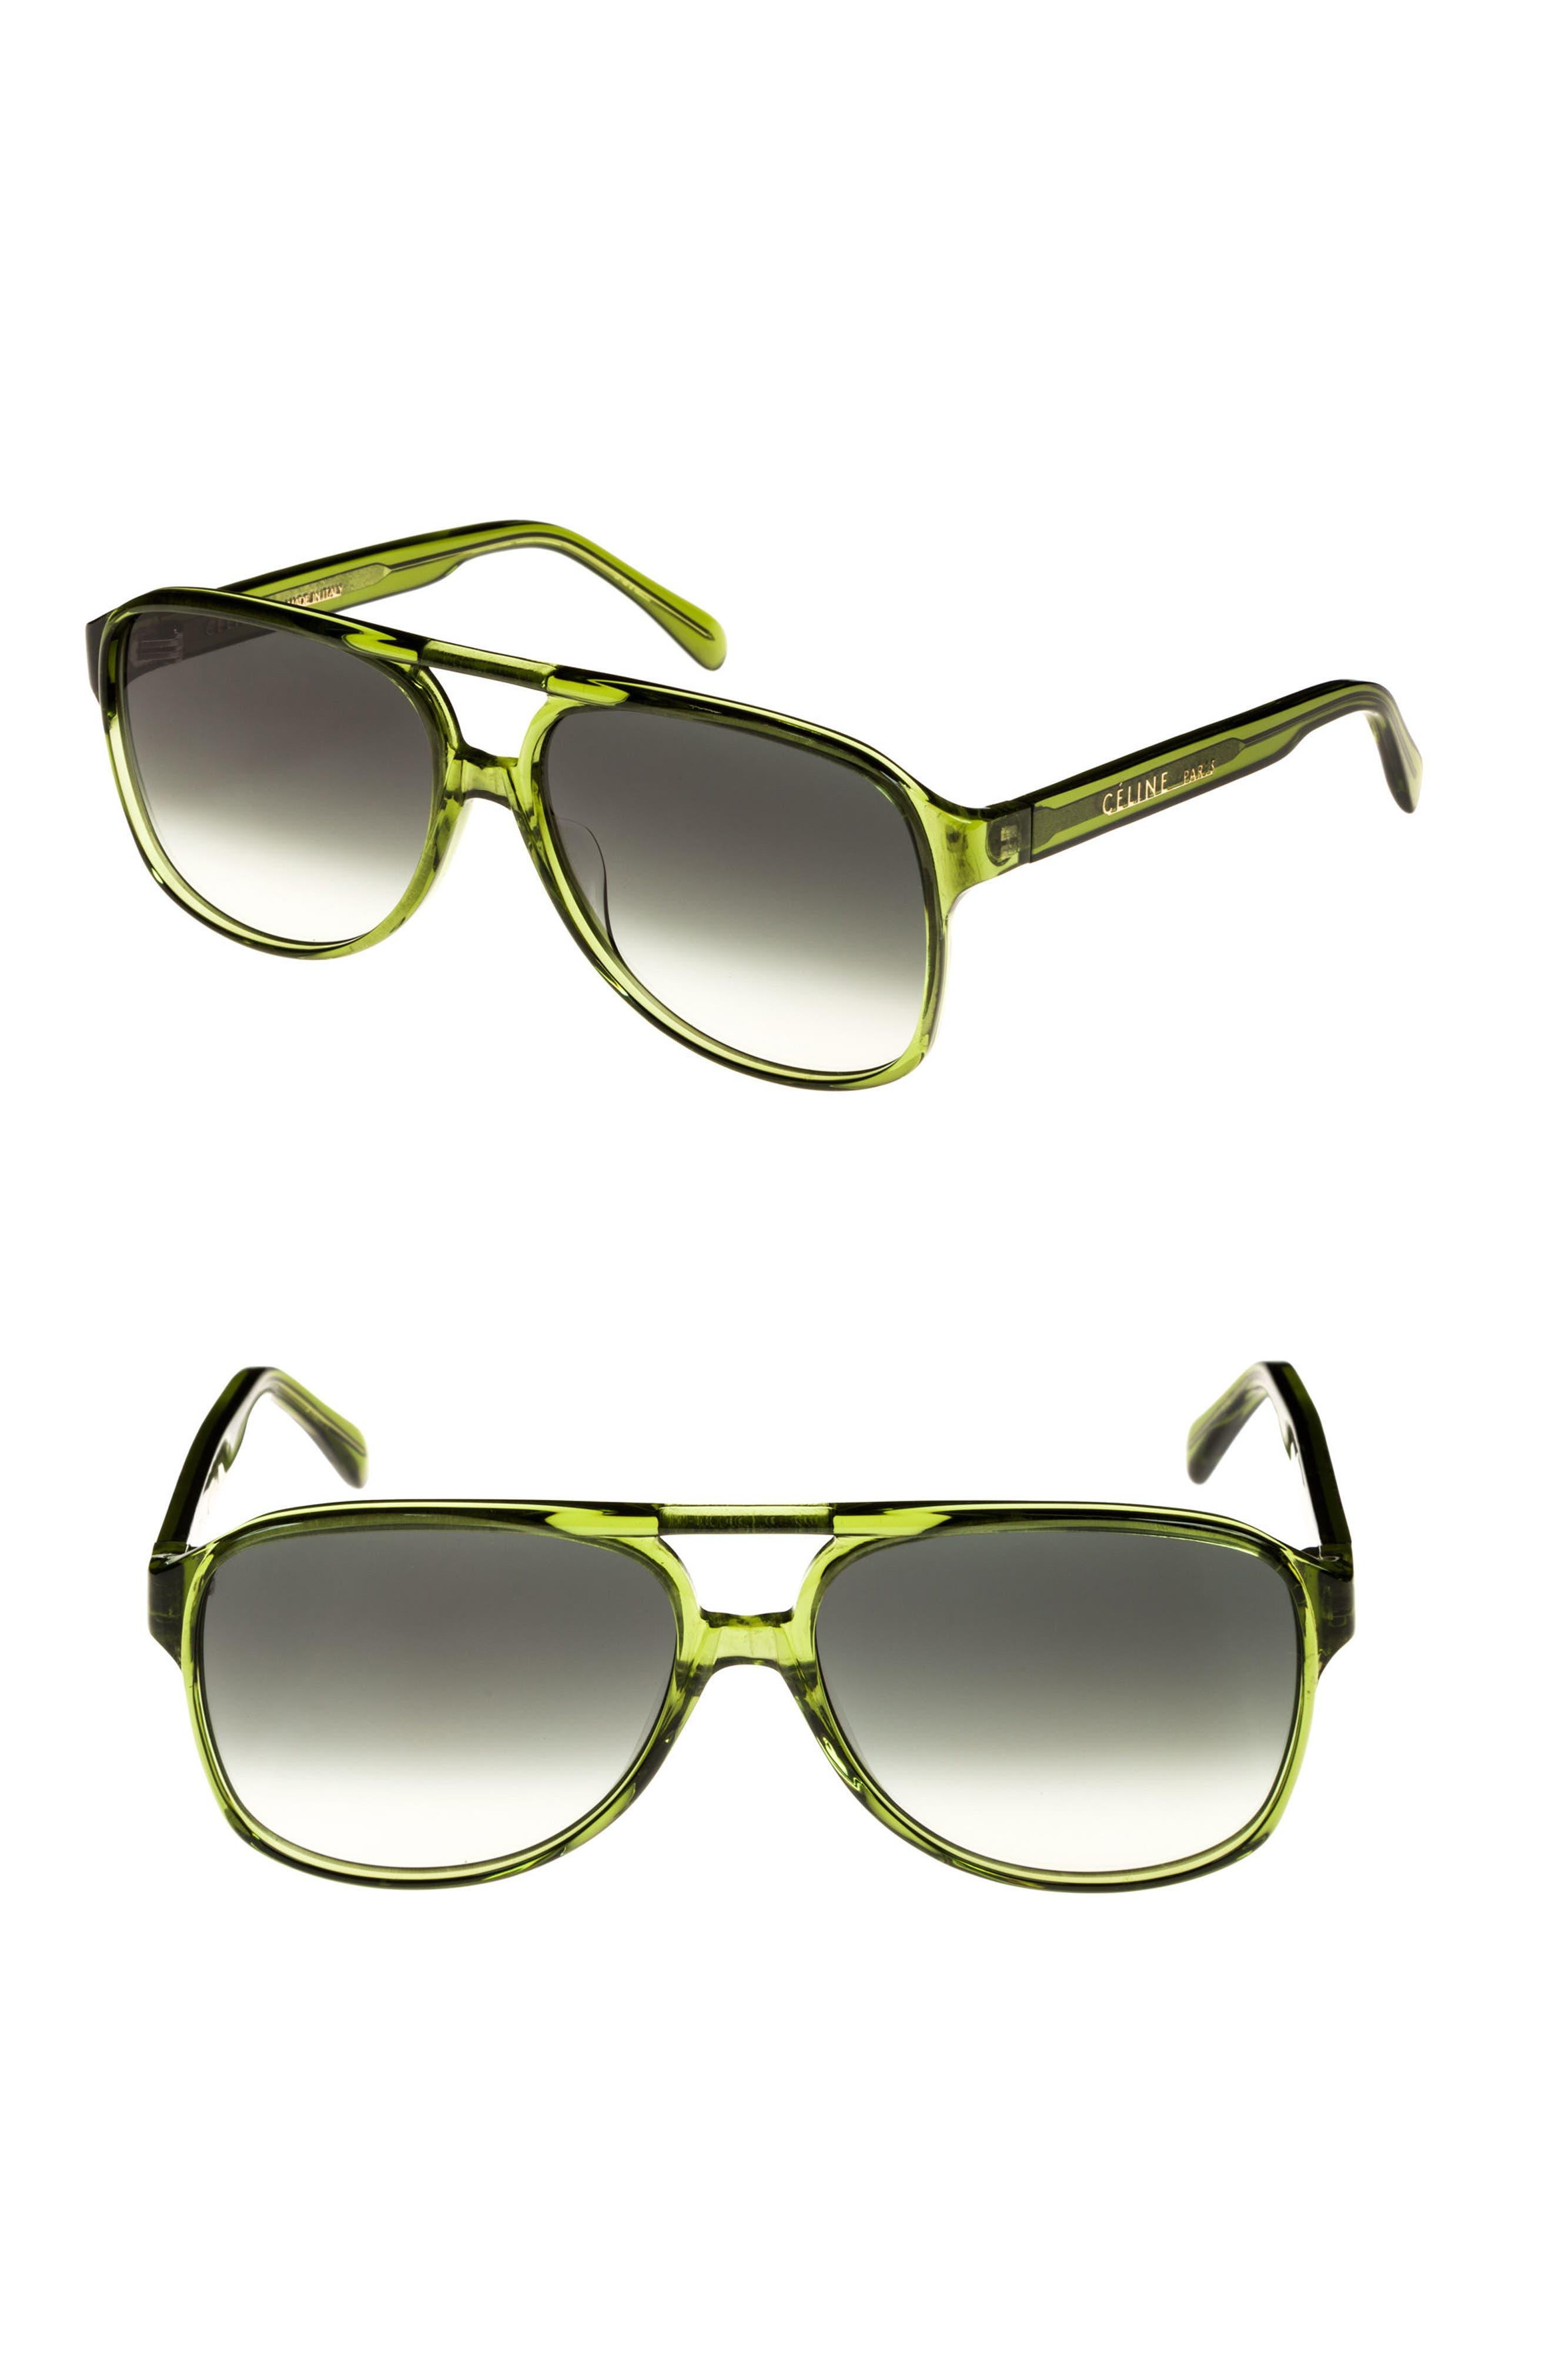 Céline 62mm Oversize Aviator Sunglasses